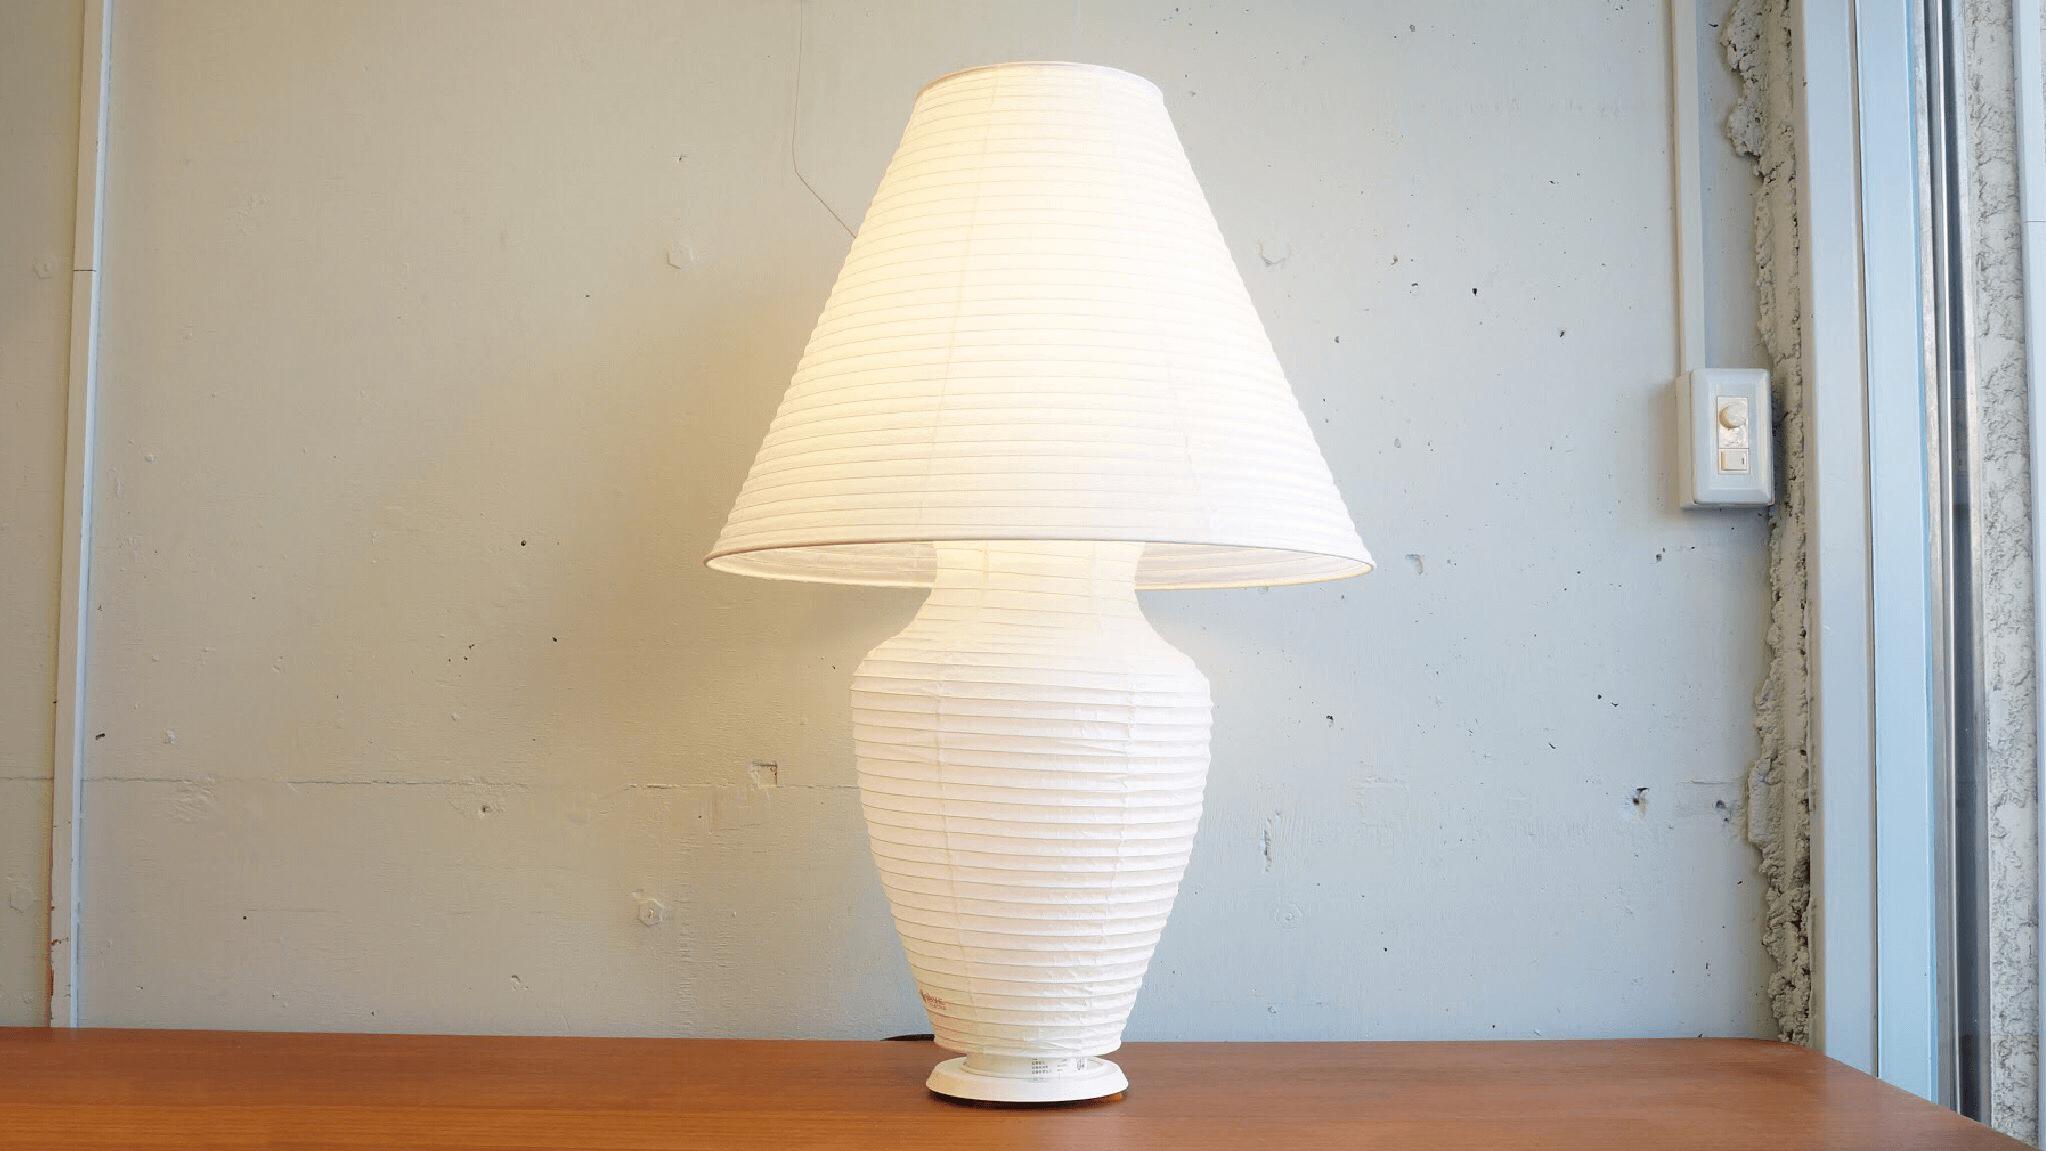 Cibone Ron Gilad design Table Lamp/シボネ ロン・ギラッド デザイン テーブルランプ